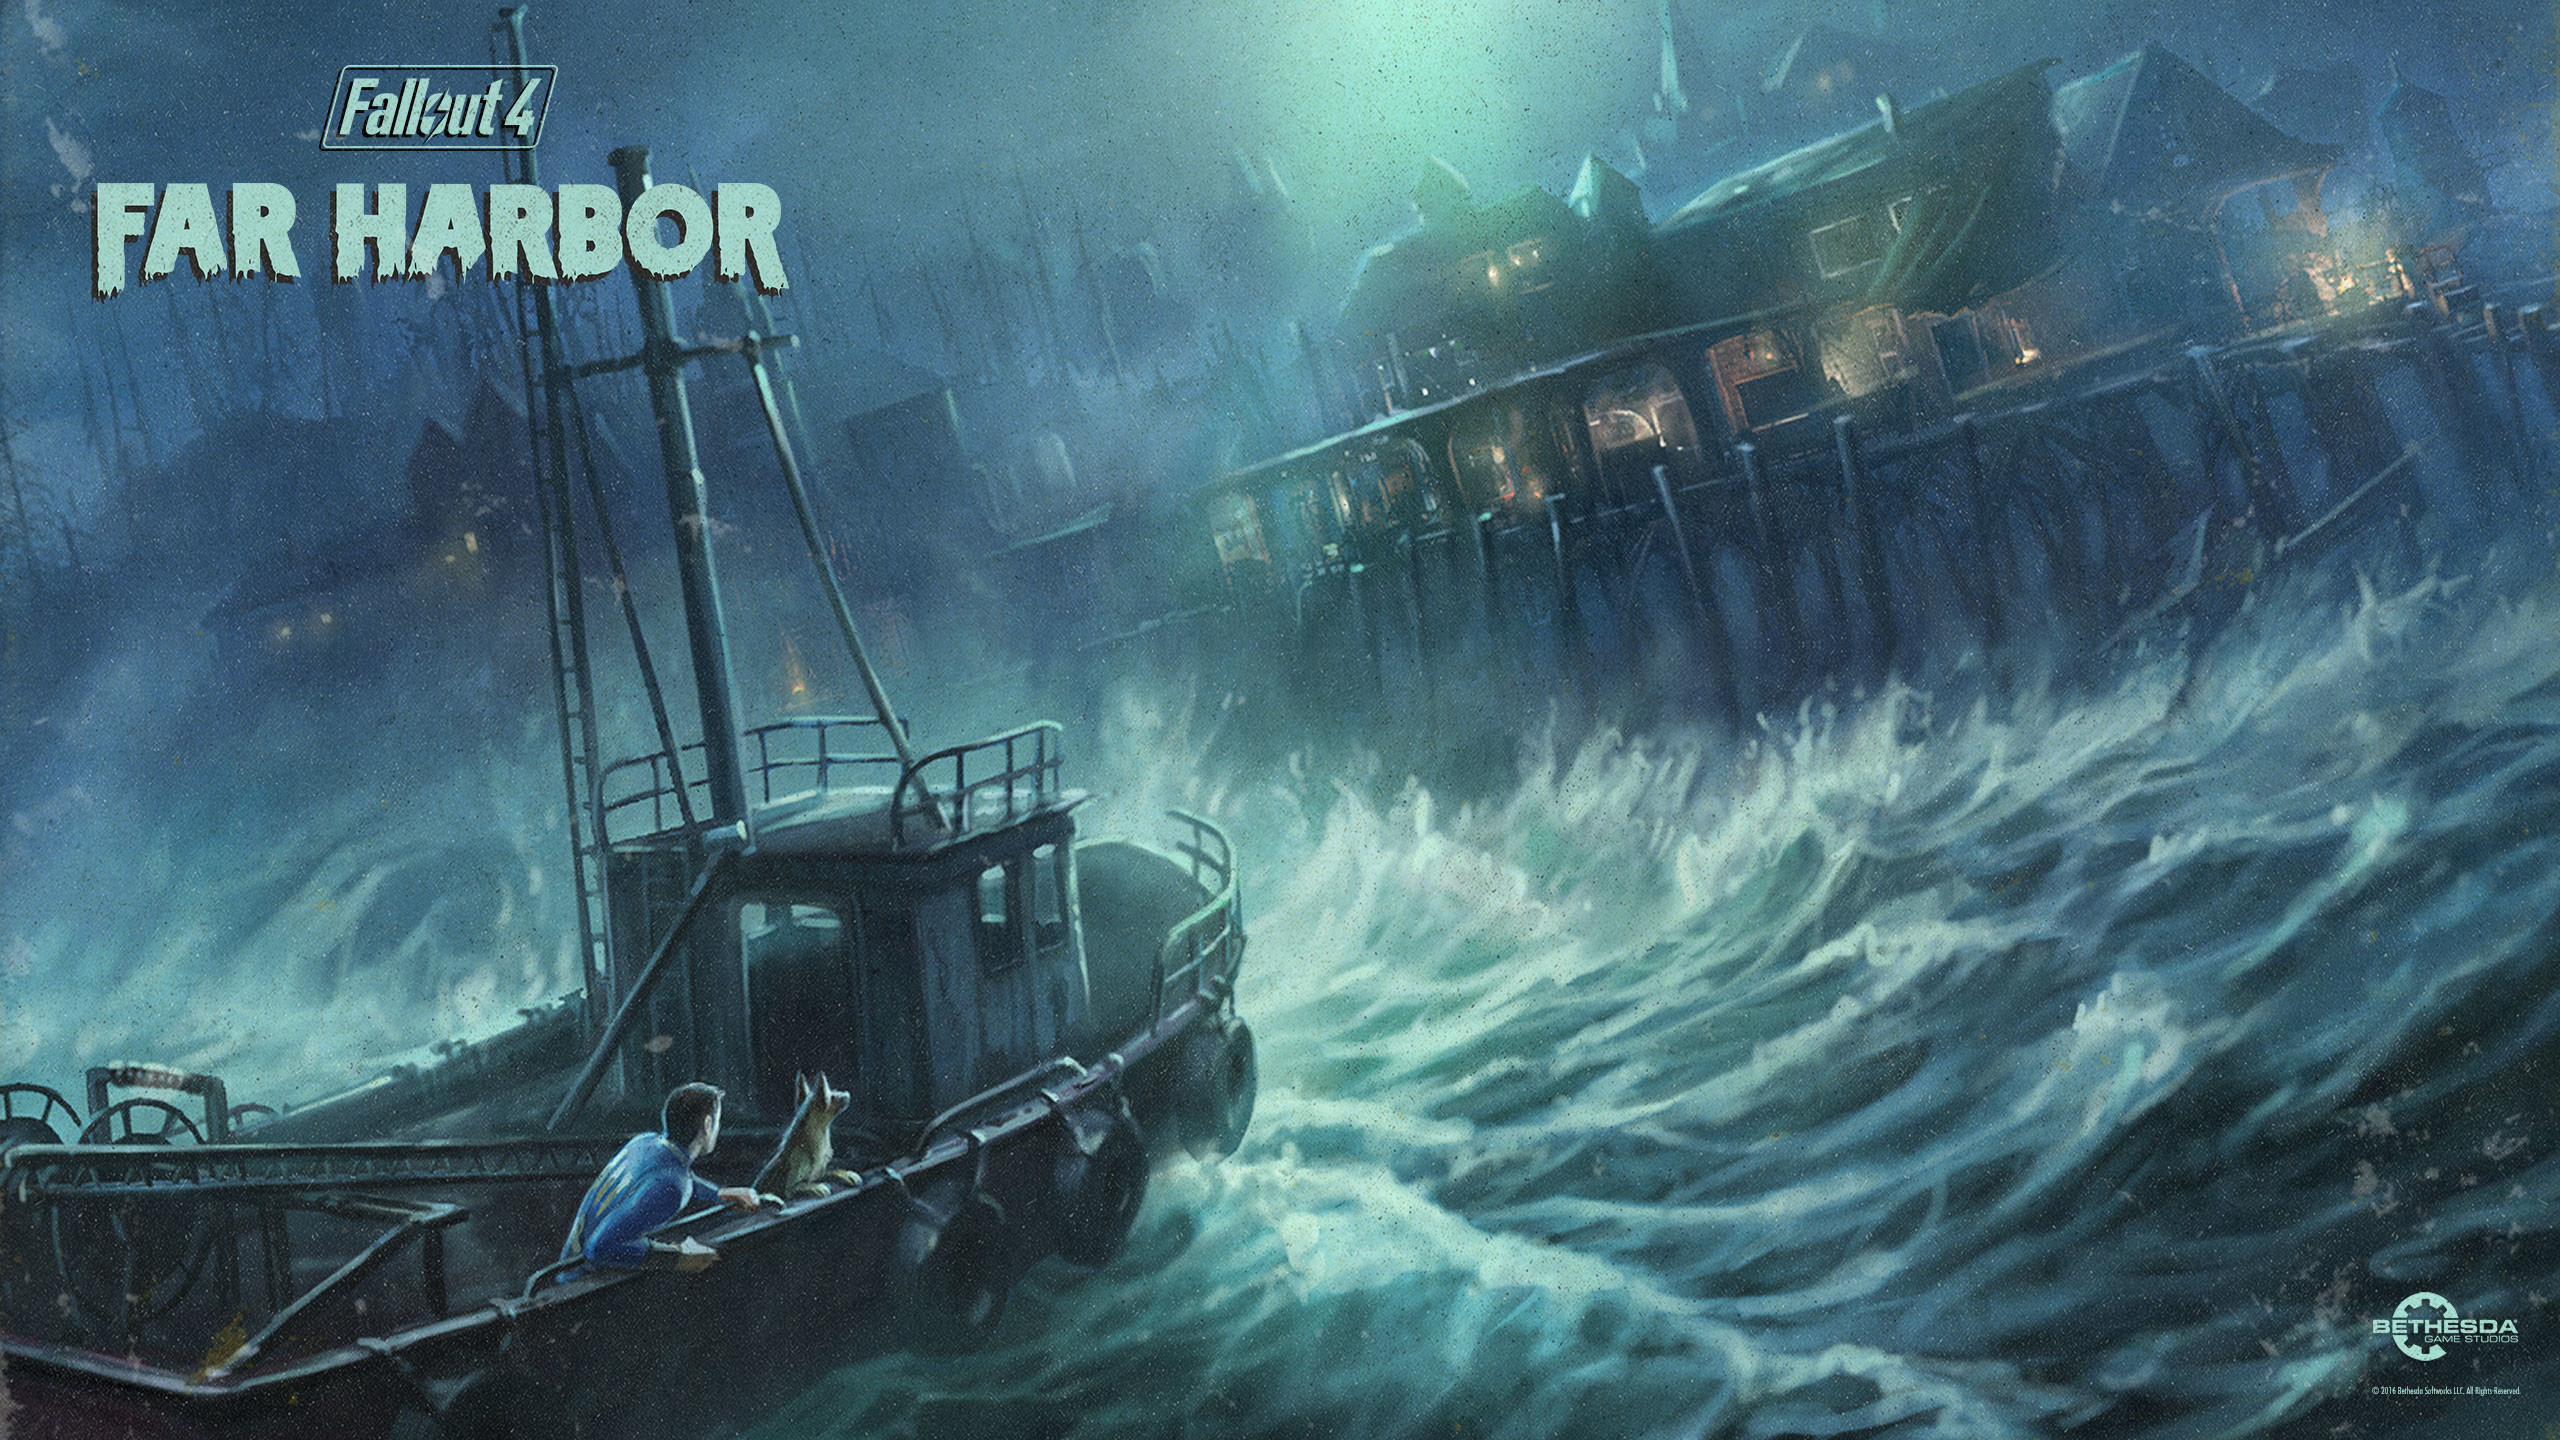 Fallout 4: Far Harbor Wallpaper Download Original (2560×1440)